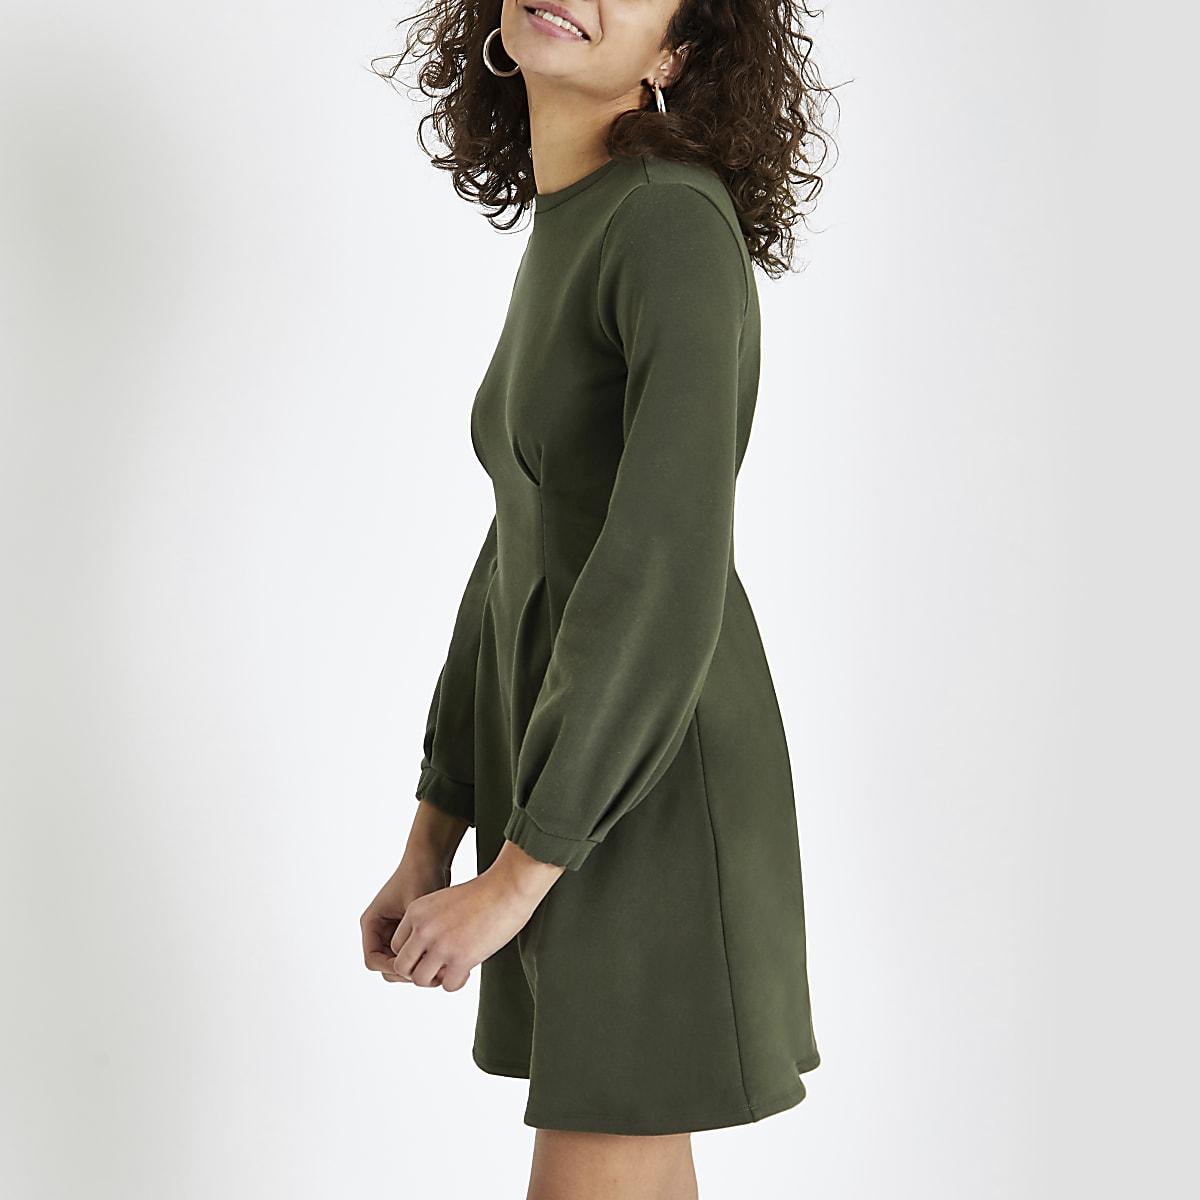 Khaki long sleeve jumper dress